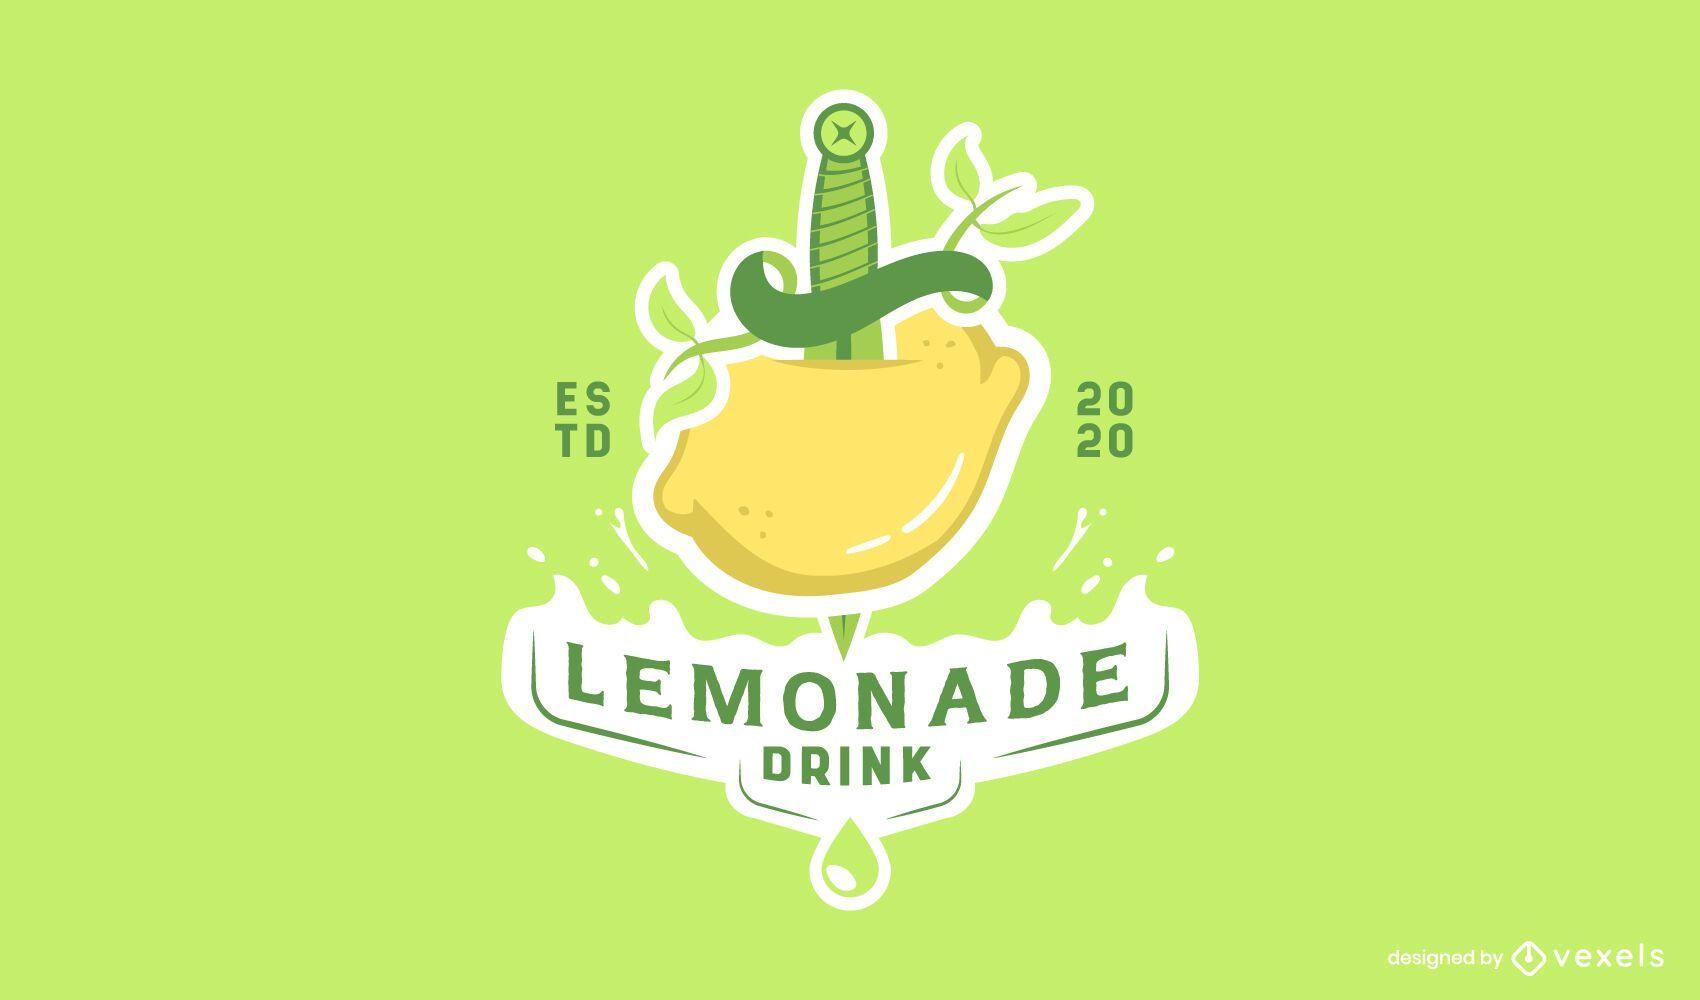 Lemonade drink logo template